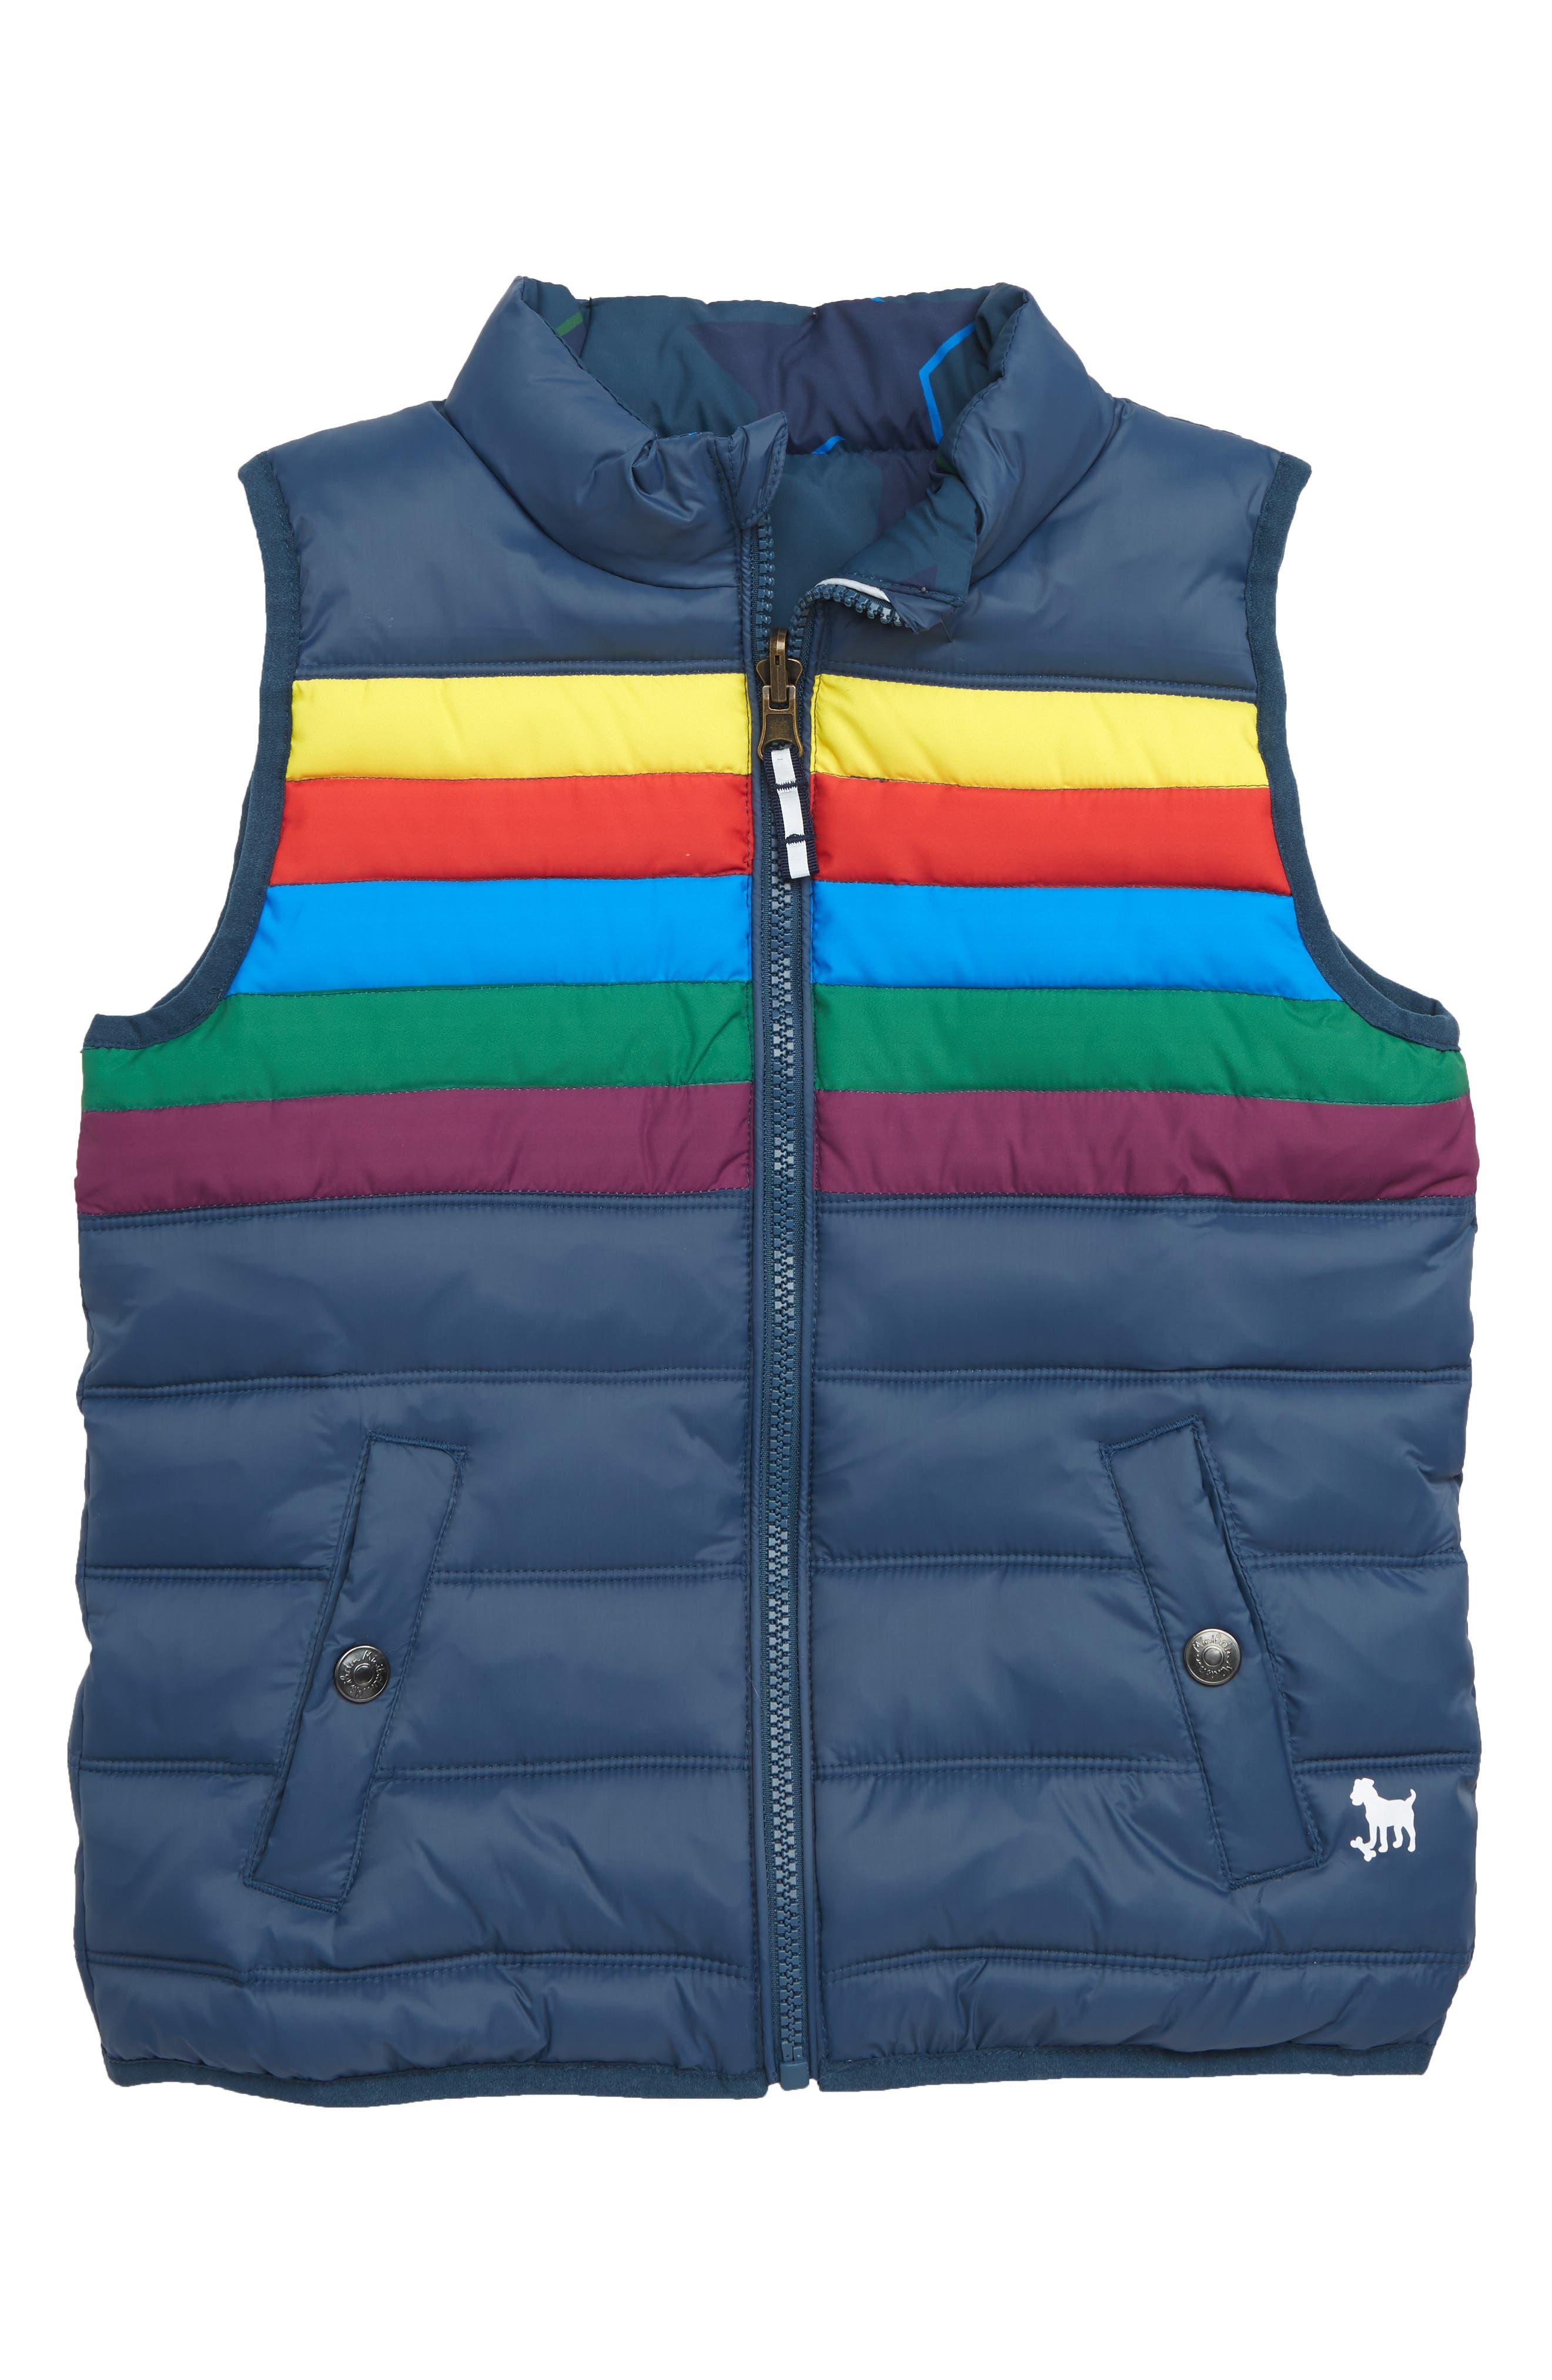 Boys Mini Boden Reversible Puffer Vest Size 45Y  Blue